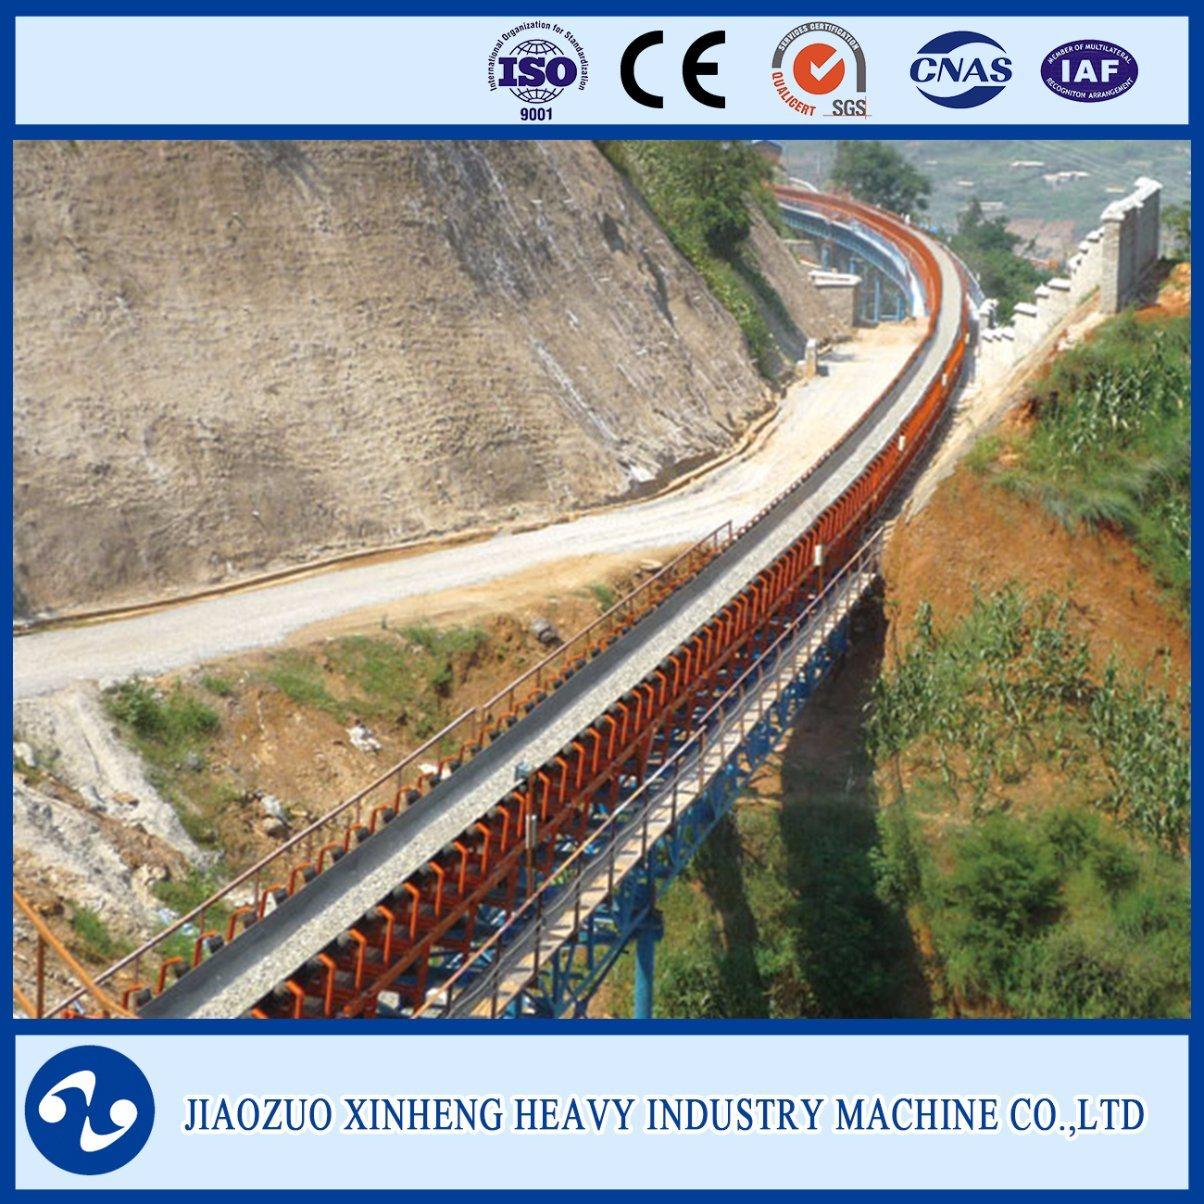 Belt Conveyor for Heavy Duty Industry, Mining, Coal, Power Plant